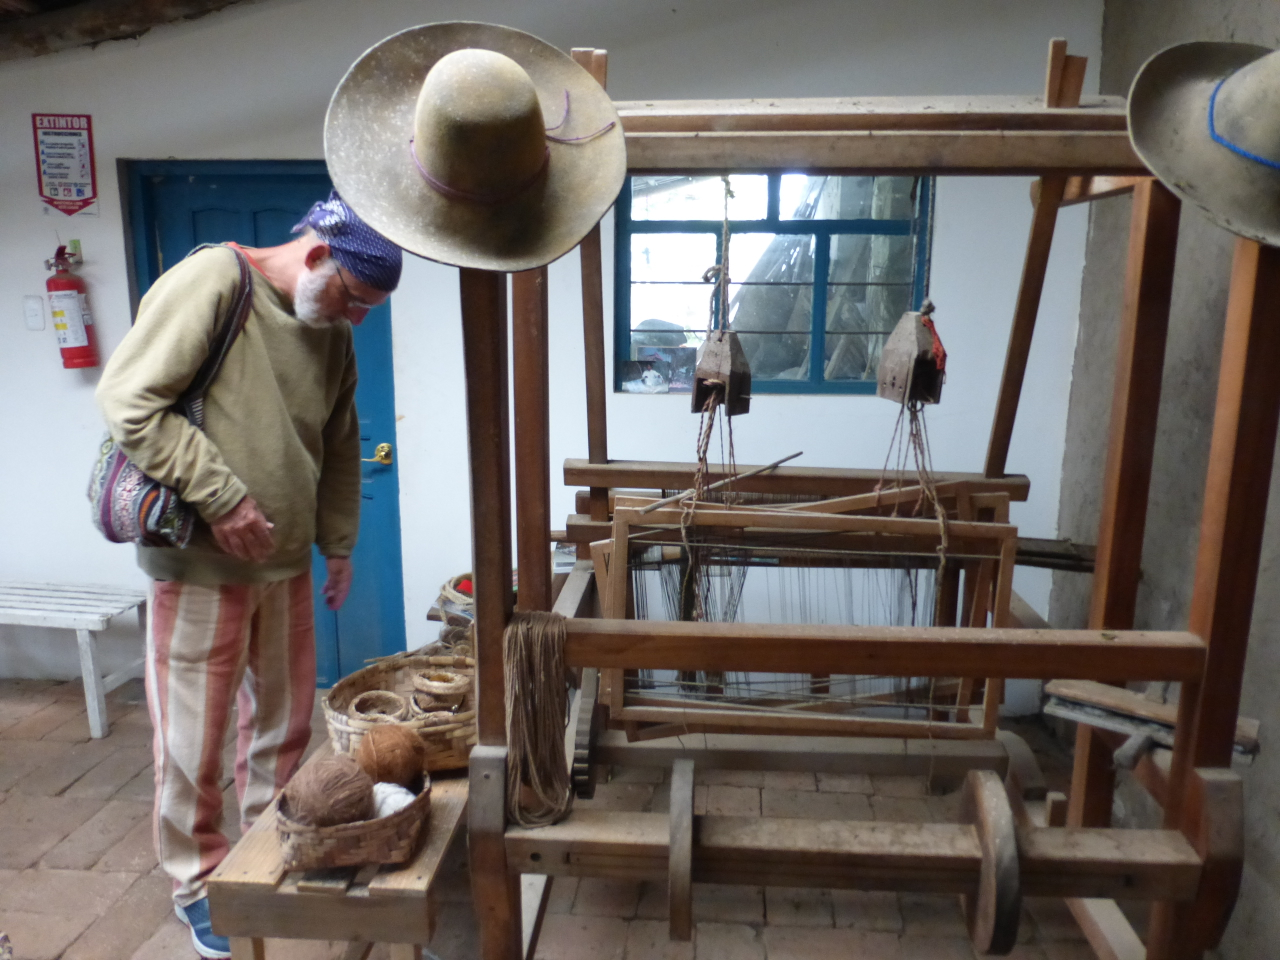 This studio also has a floor loom